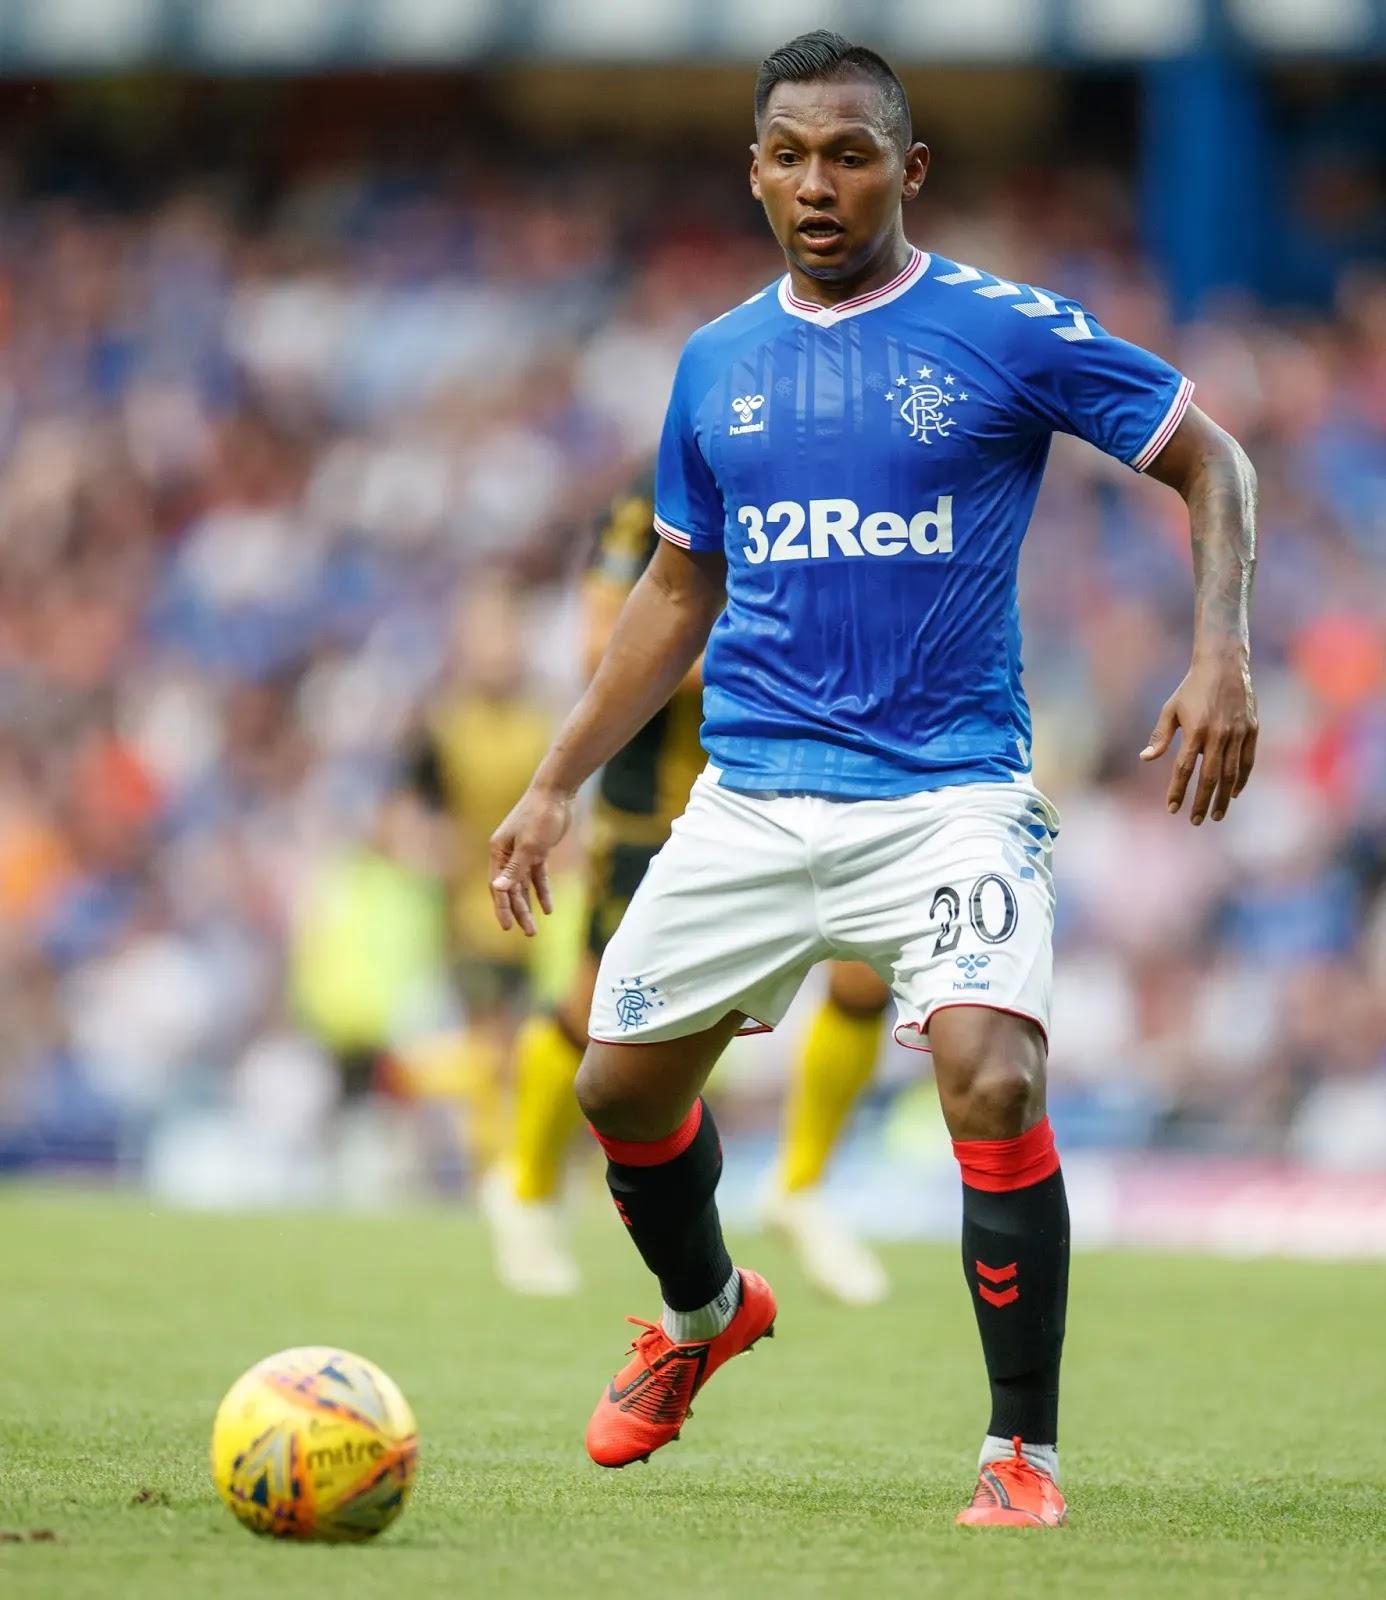 Scottish press in 'telling lies about Rangers' shocker again…